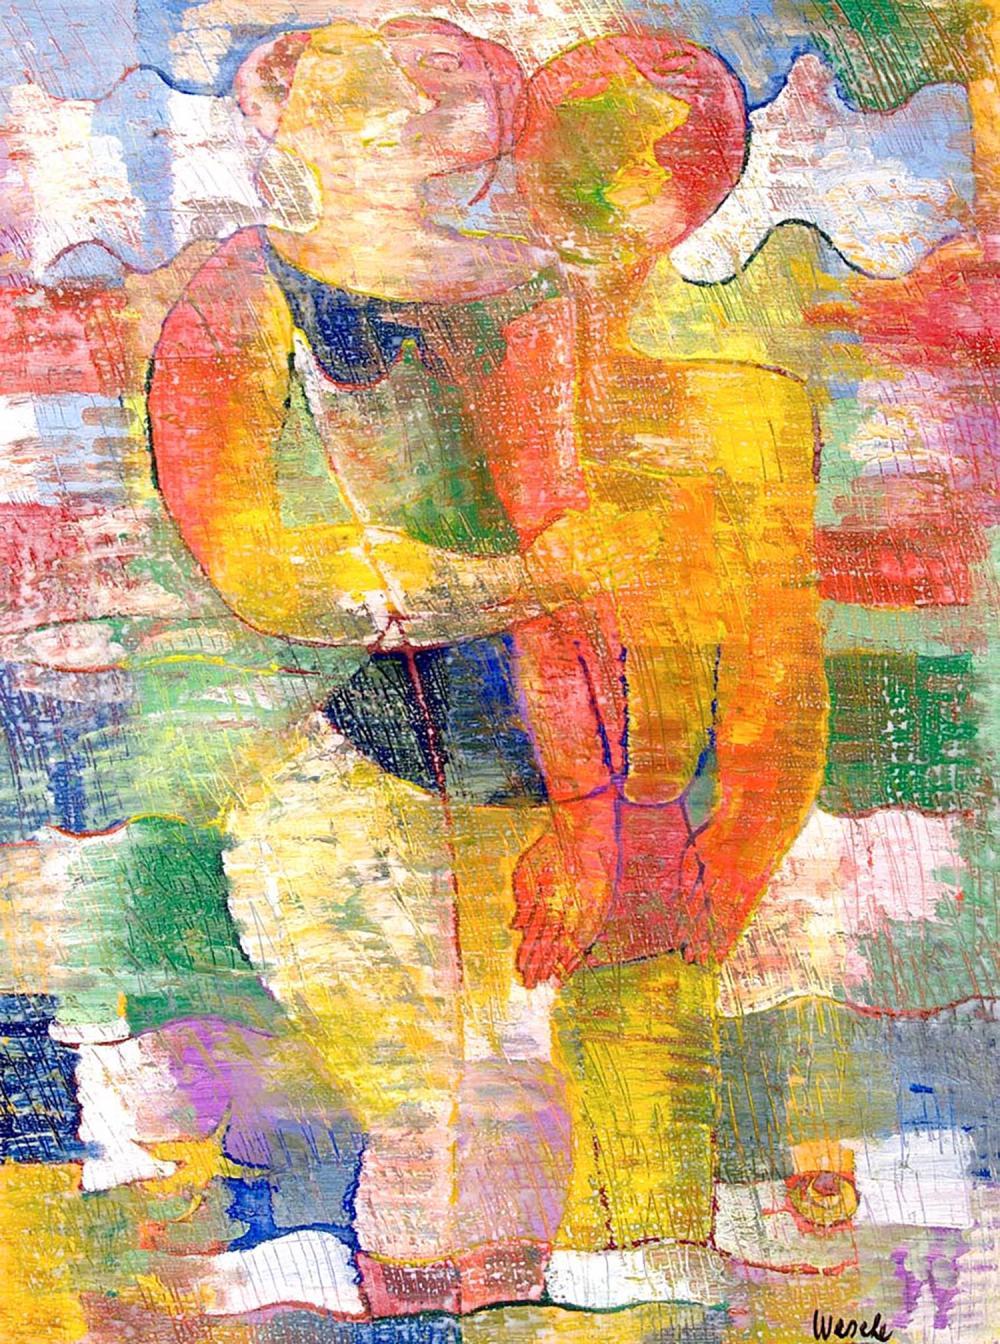 Chassis Atelier D Artiste georges wesche (1908-1995) bain de mer, 1974